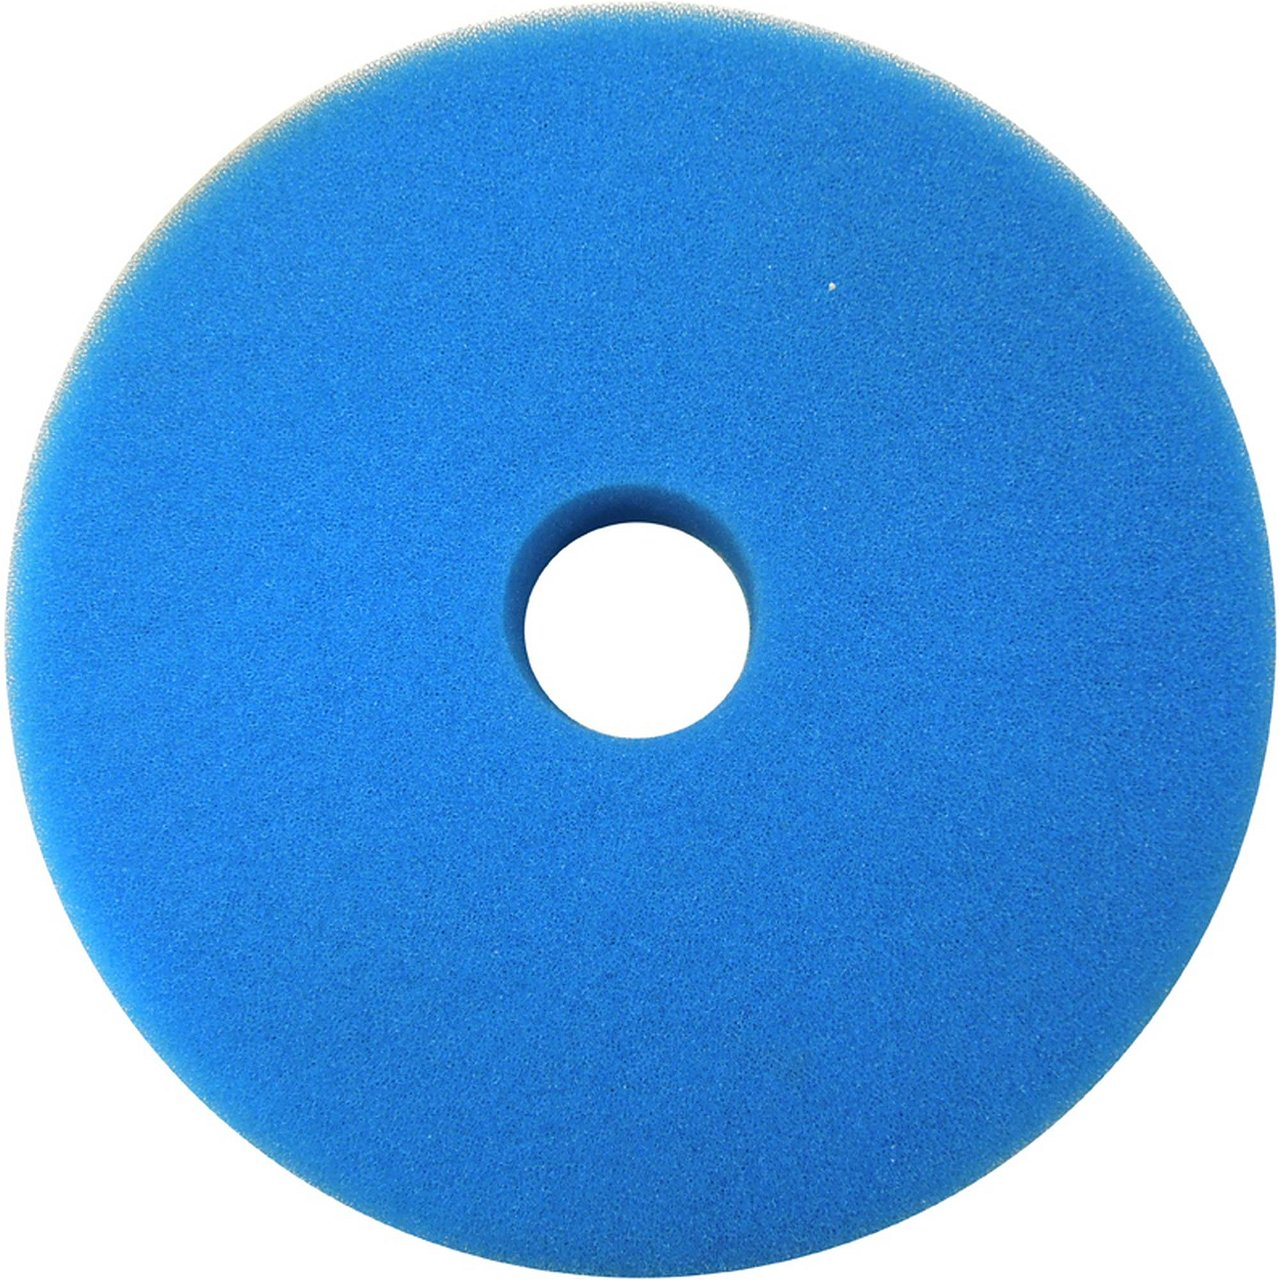 Filtersponge smooth/blue FPU10000-00